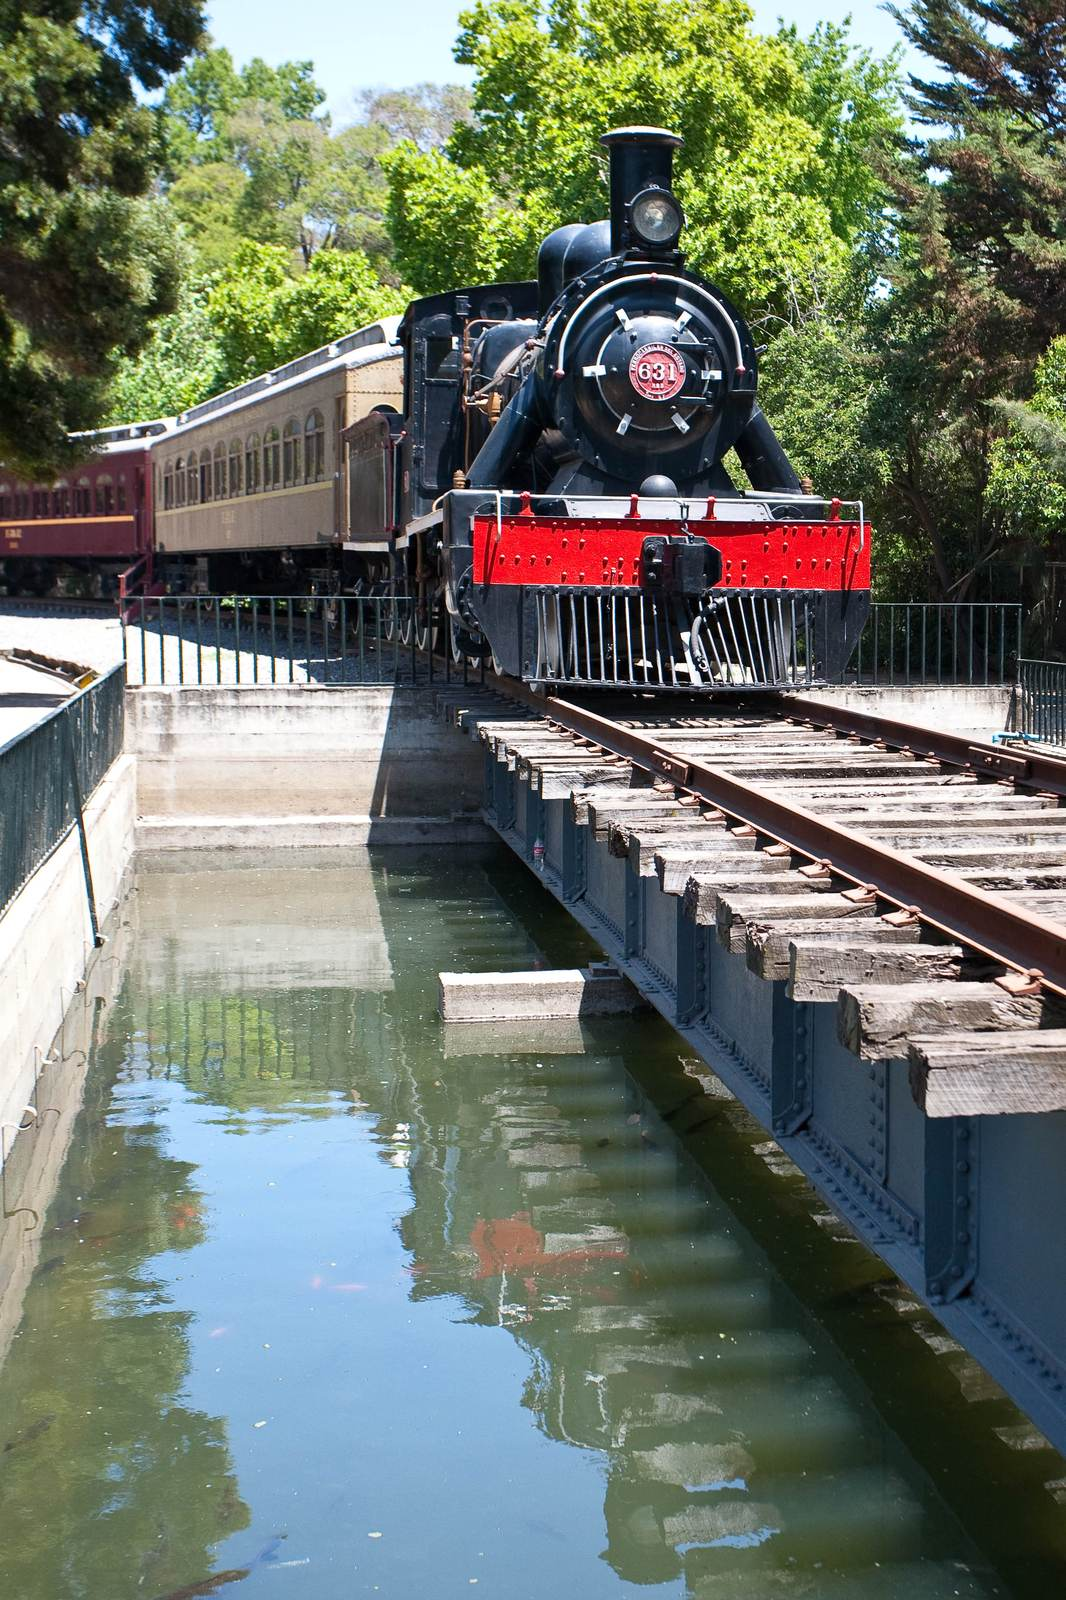 railway museum11 South American Santiago Railway Museum in Chile